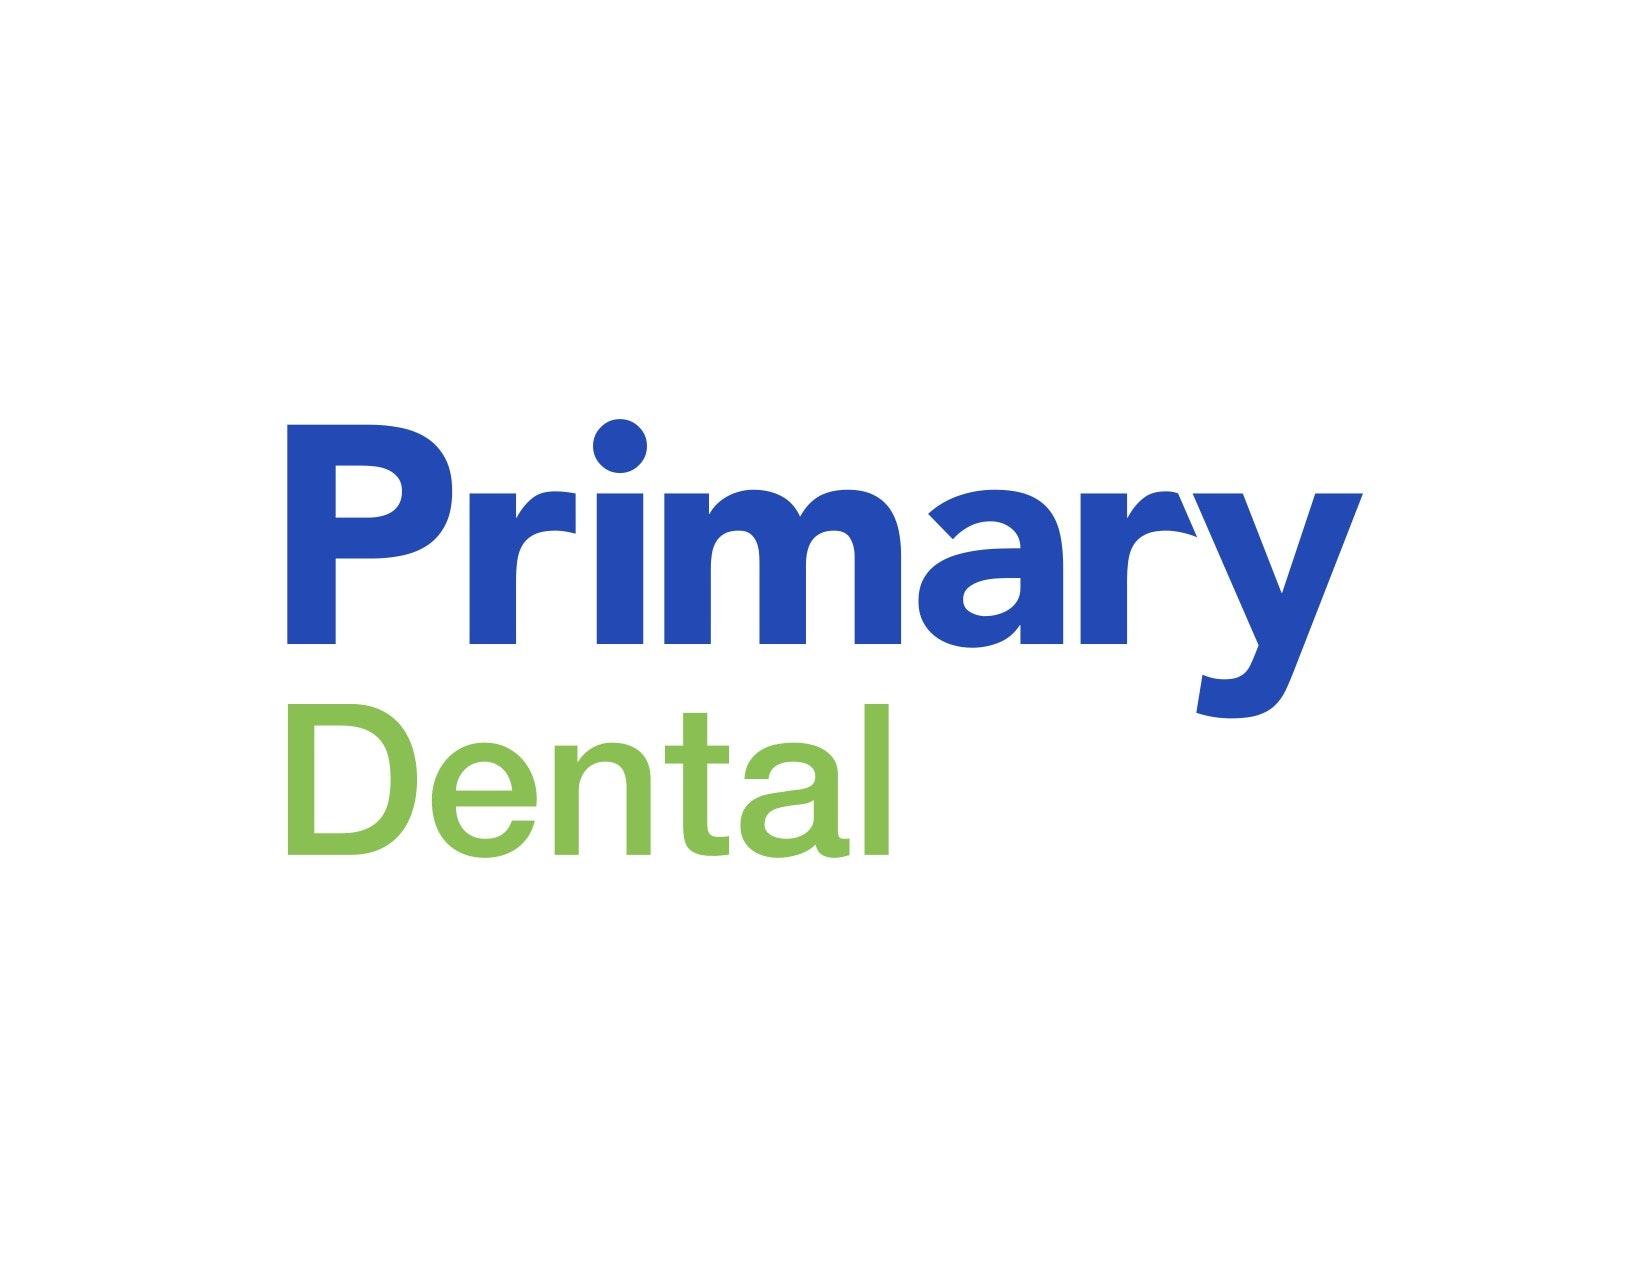 Seymour Street Medical & Dental Centre Ringwood (Primary Dental)